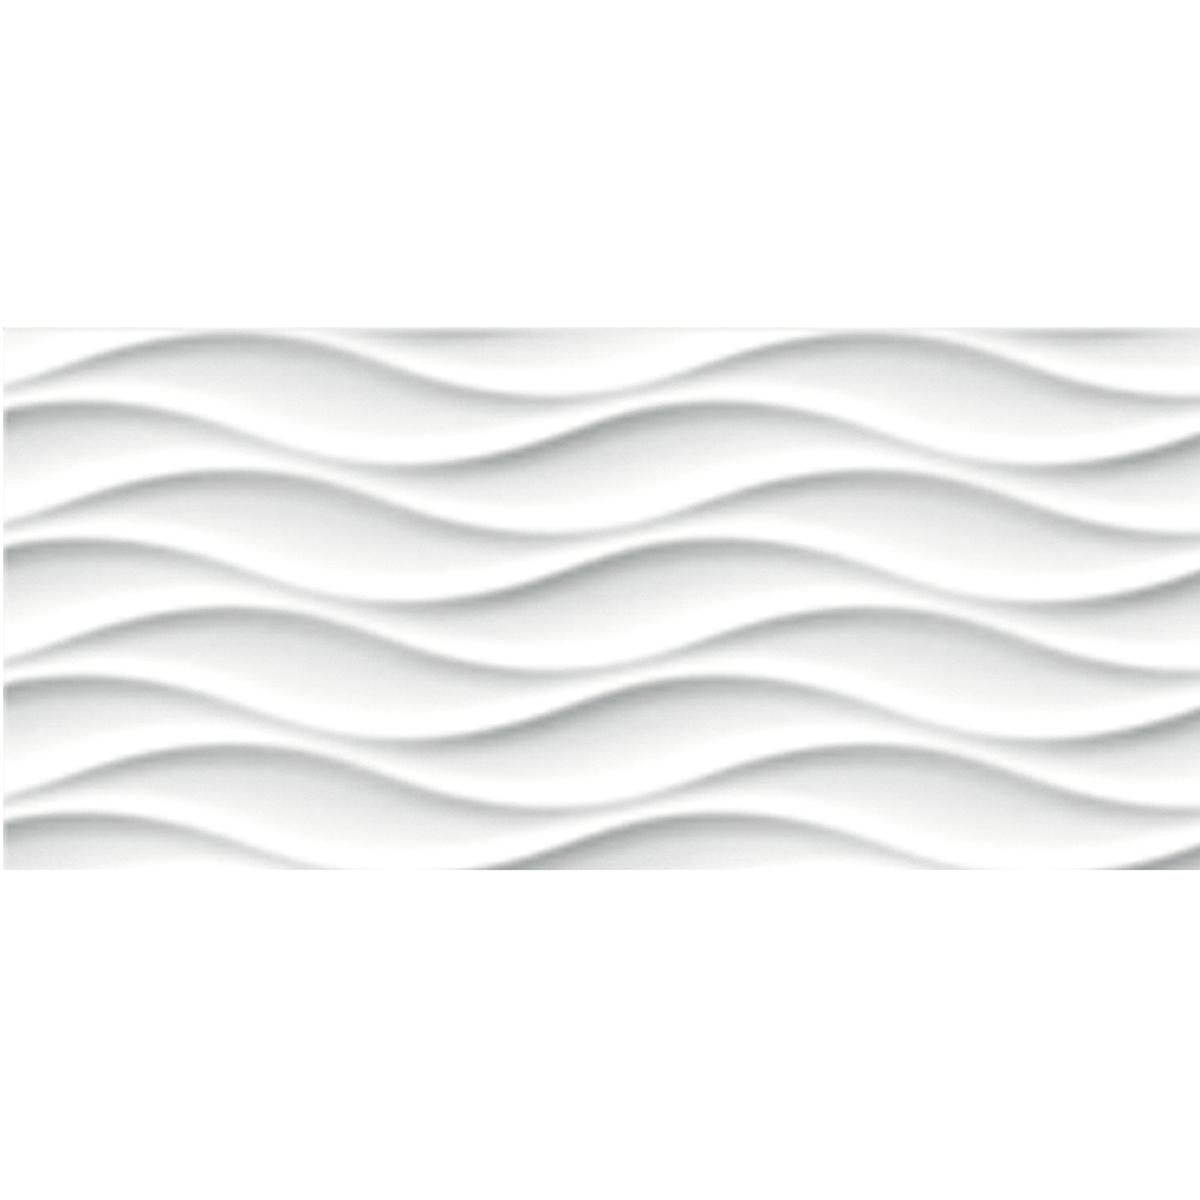 Фото - Плитка Cersanit Wave WAG051 20x44 см плитка cersanit mono my4d302 63 33х33 см